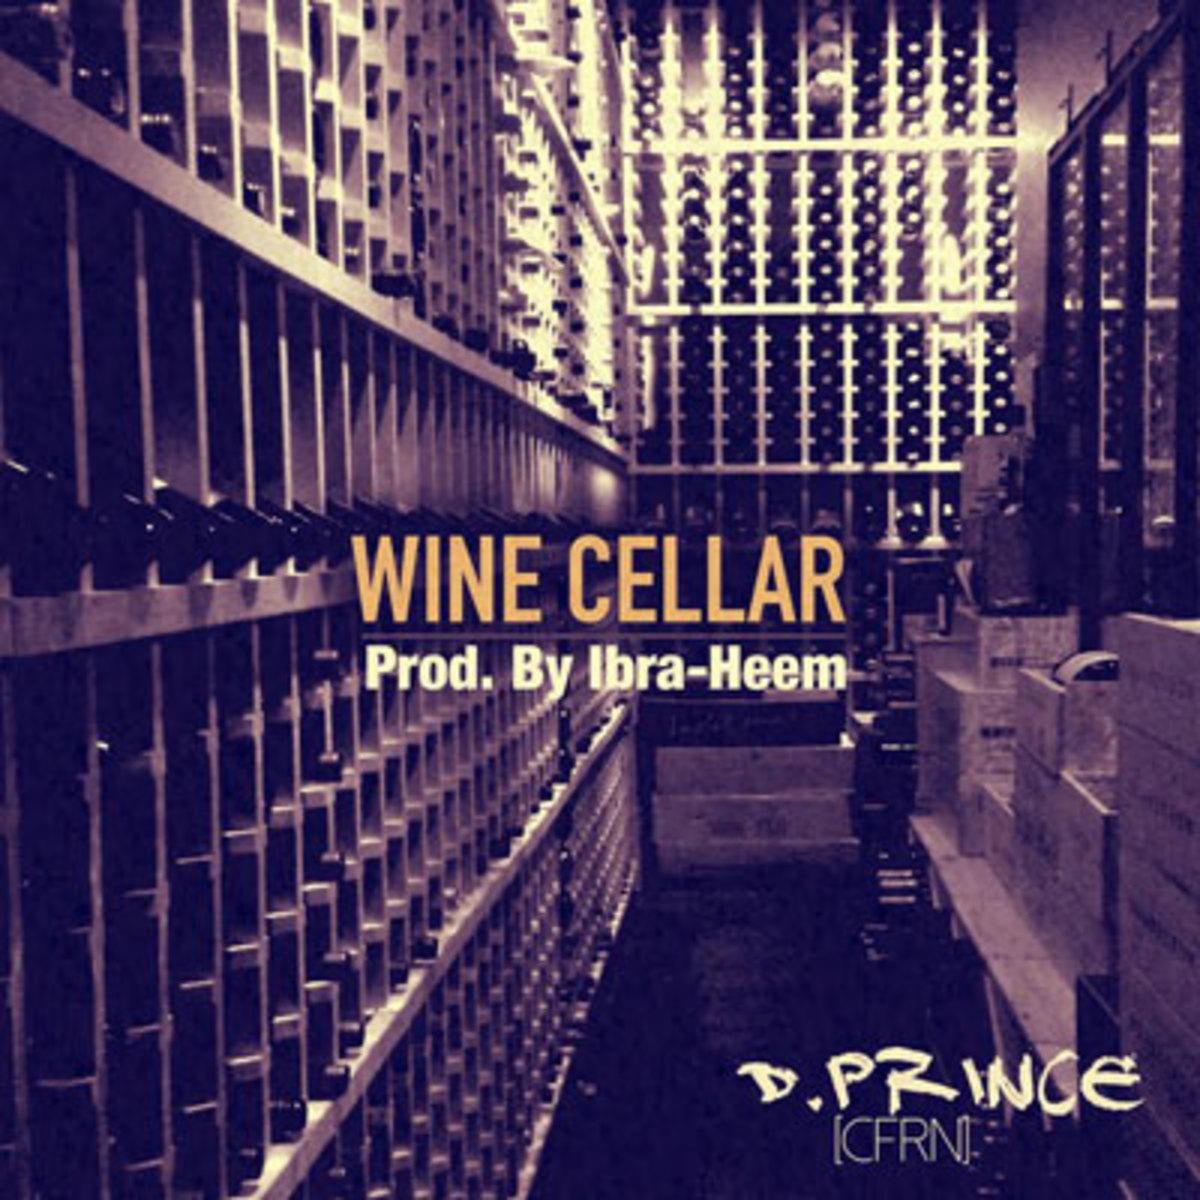 dprince-winecellar.jpg